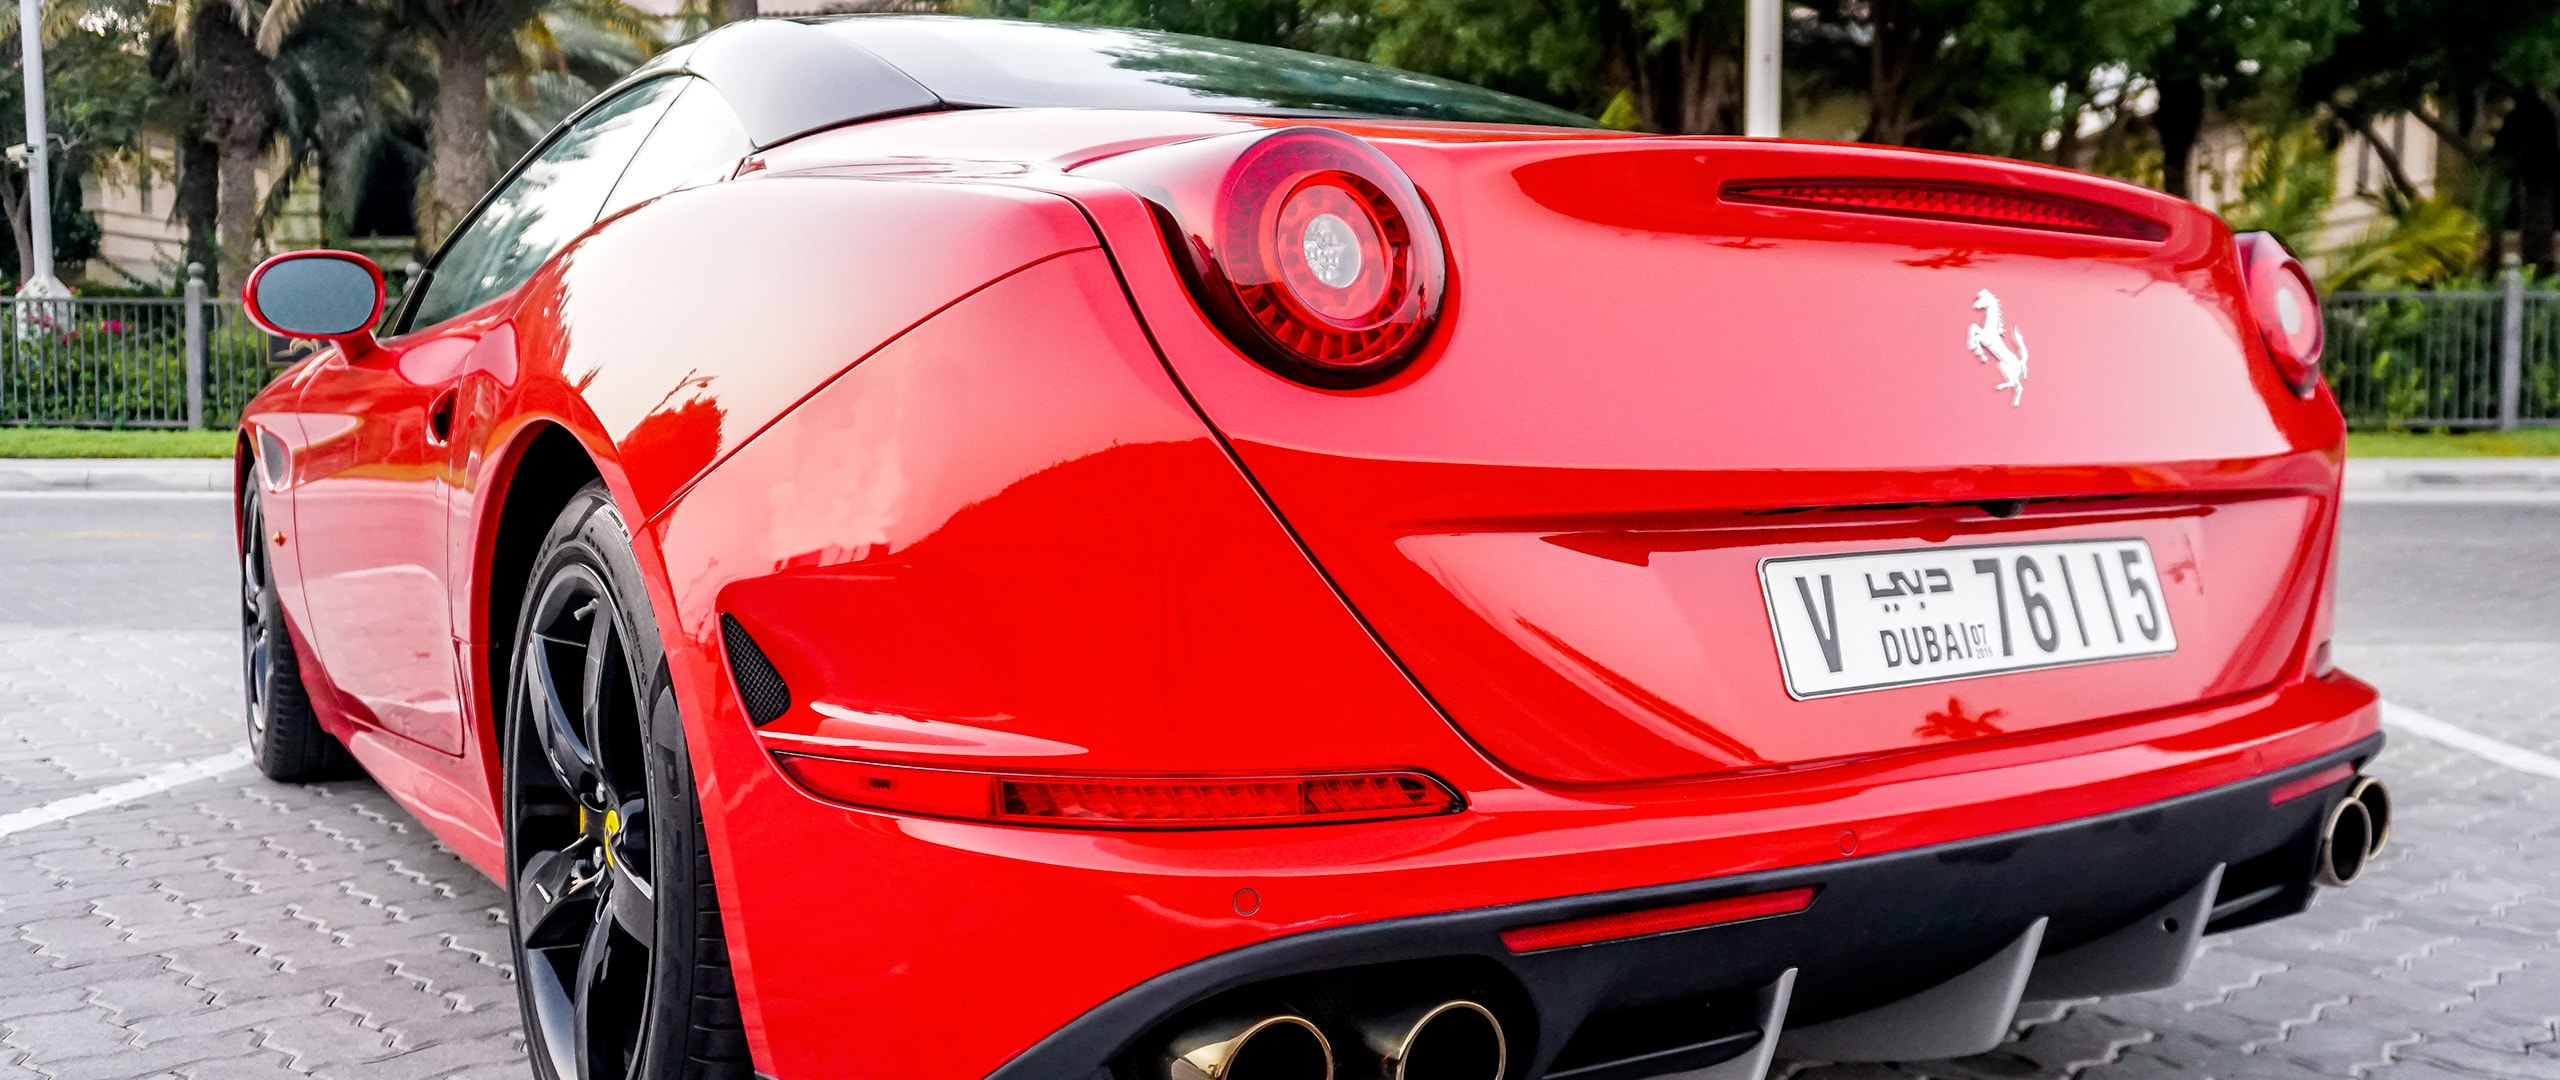 Ferrari california back